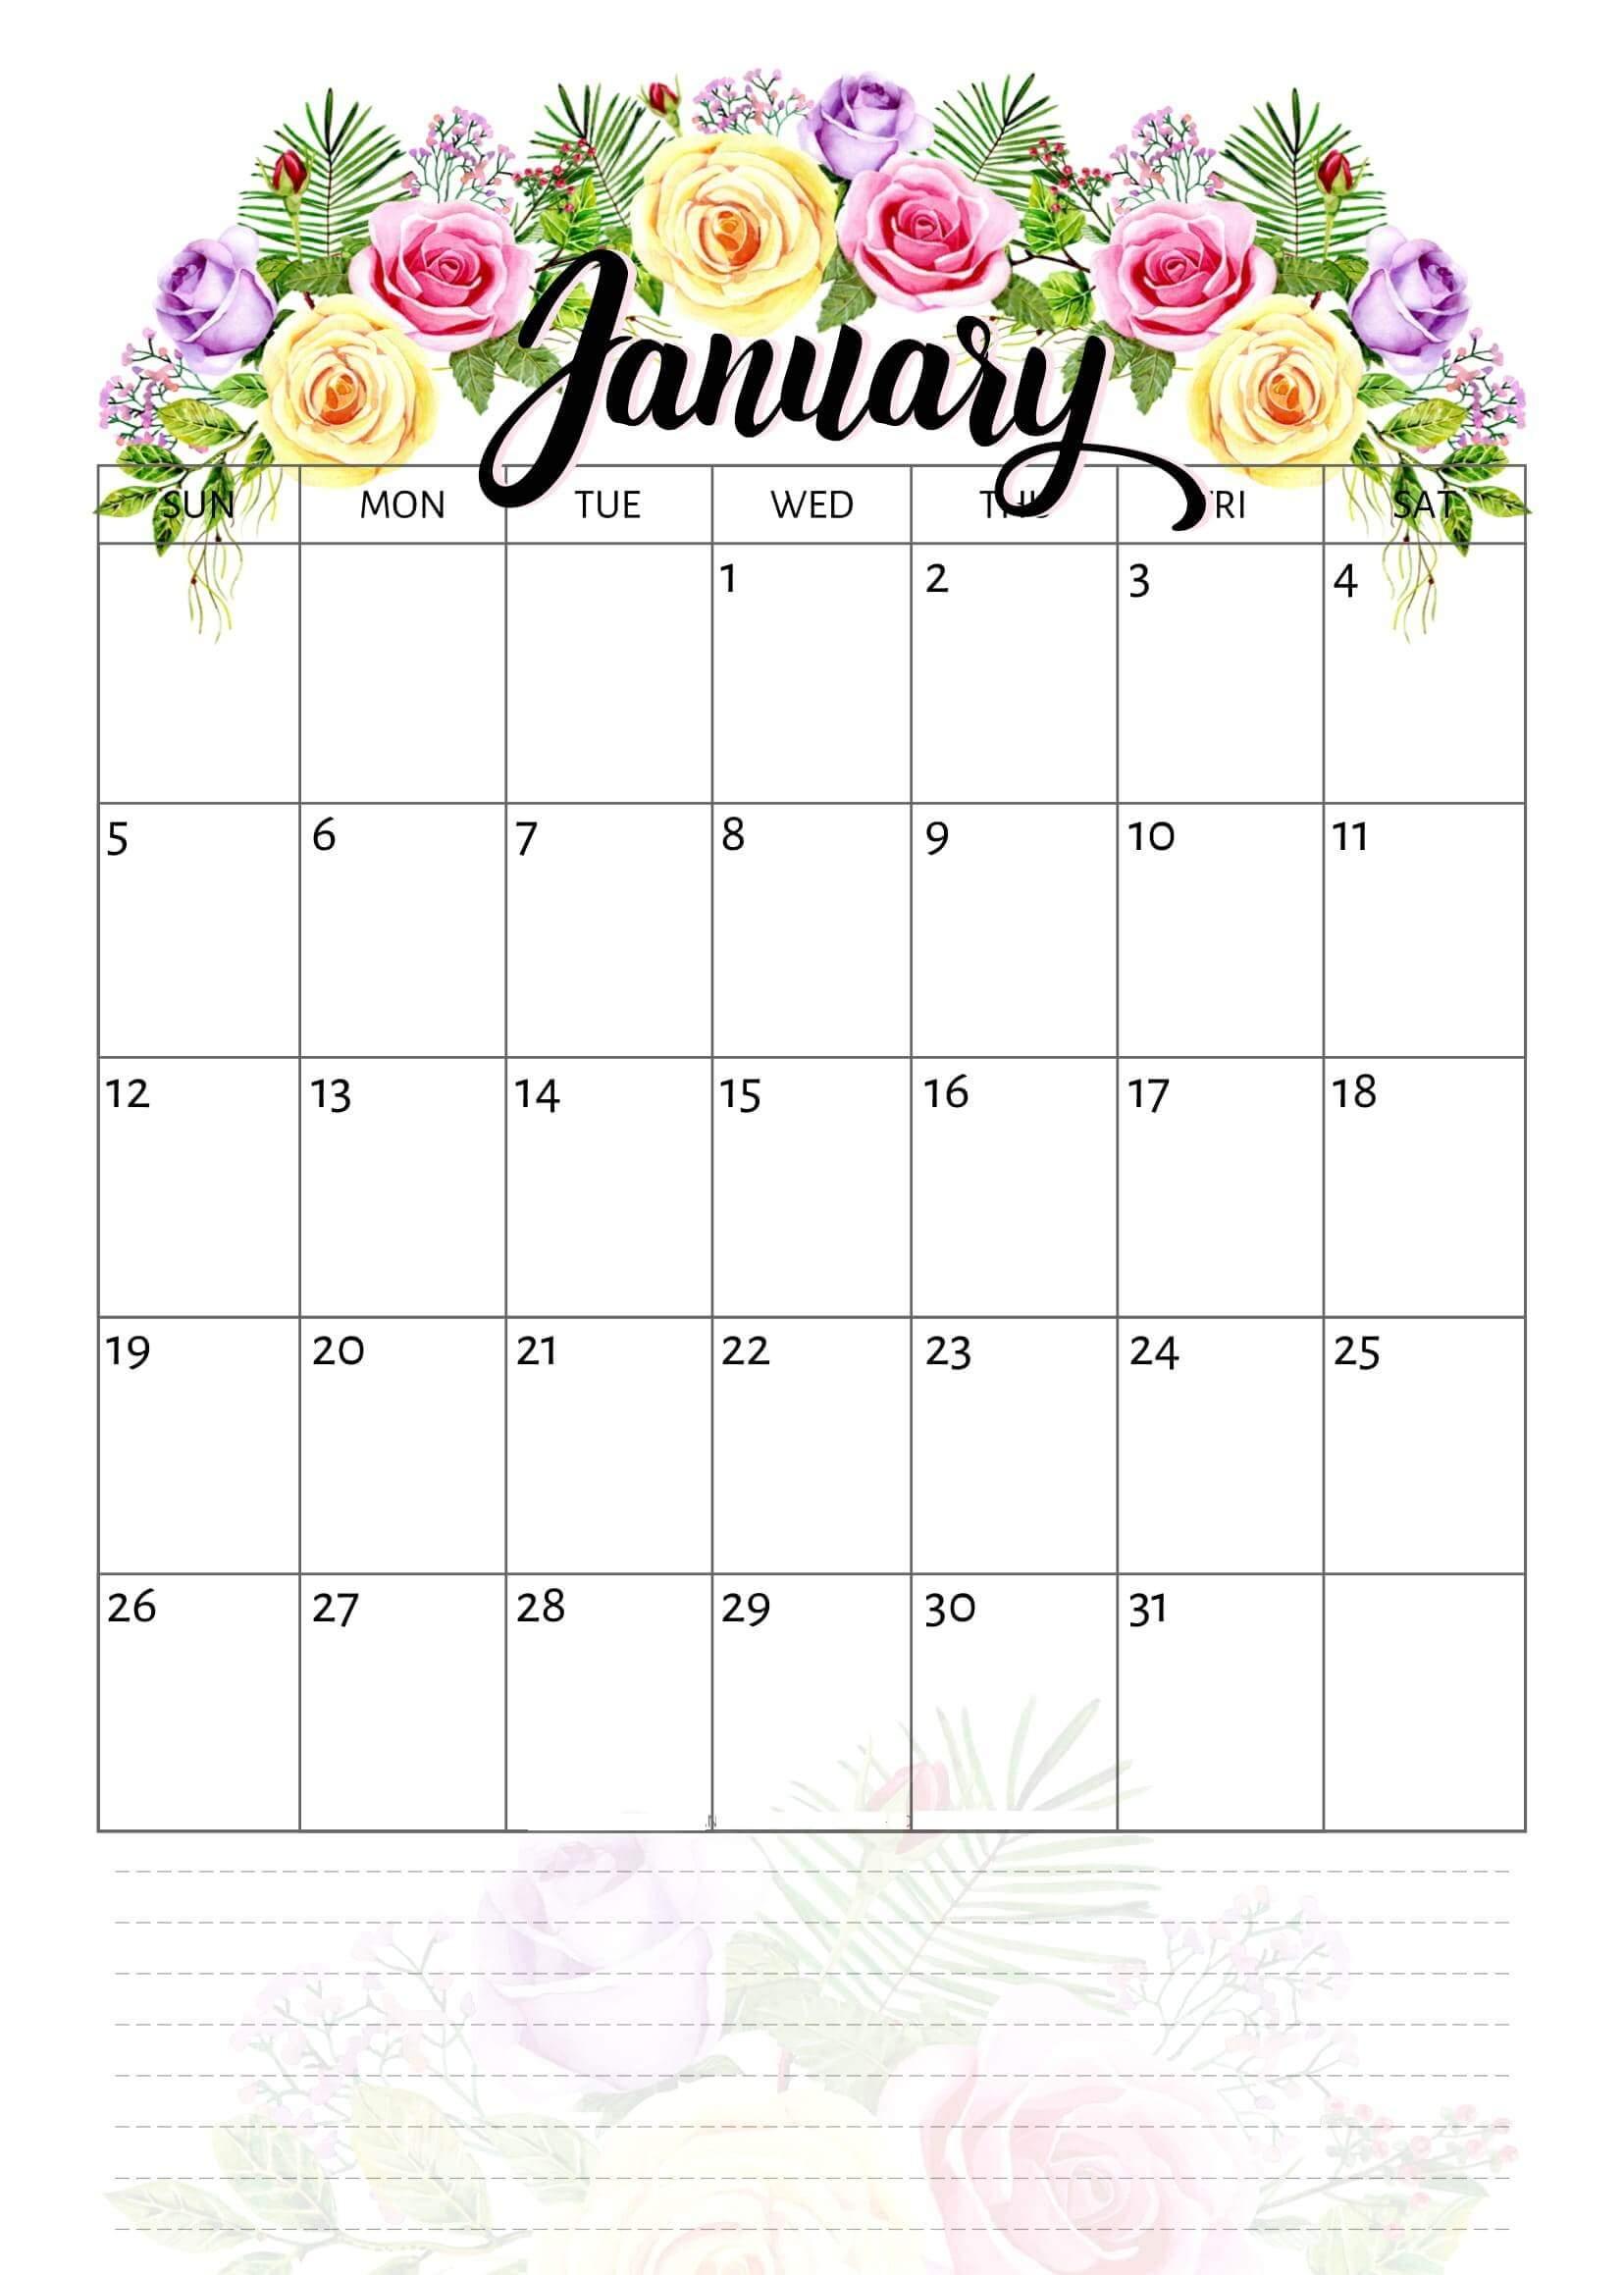 Cute January 2020 Calendar For Kids - 2019 Calendars For